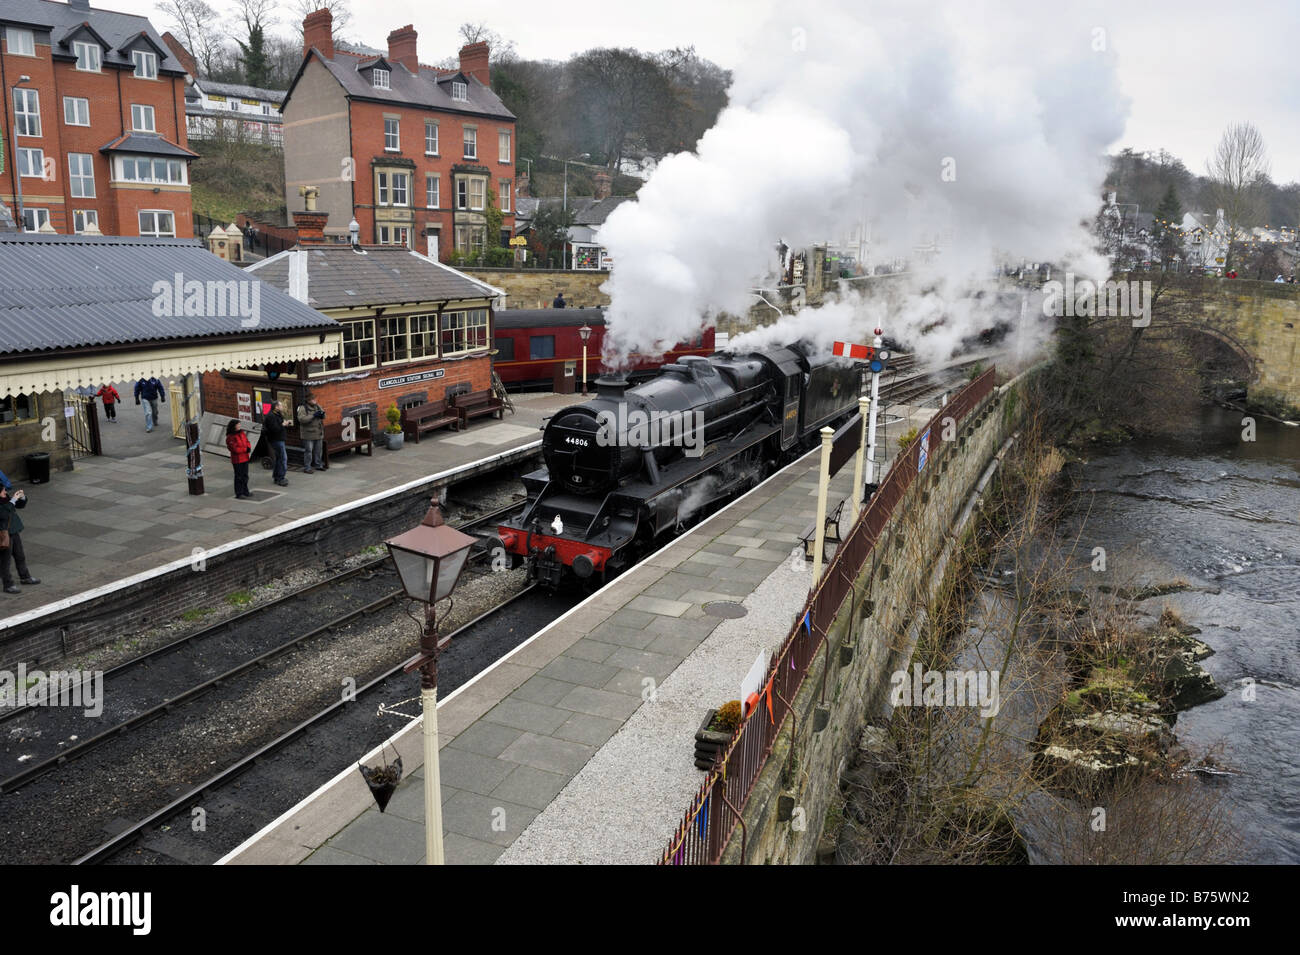 A Black Five steam locomotive at Llangollen Station, Llangollen, Wales, 2009 Stock Photo